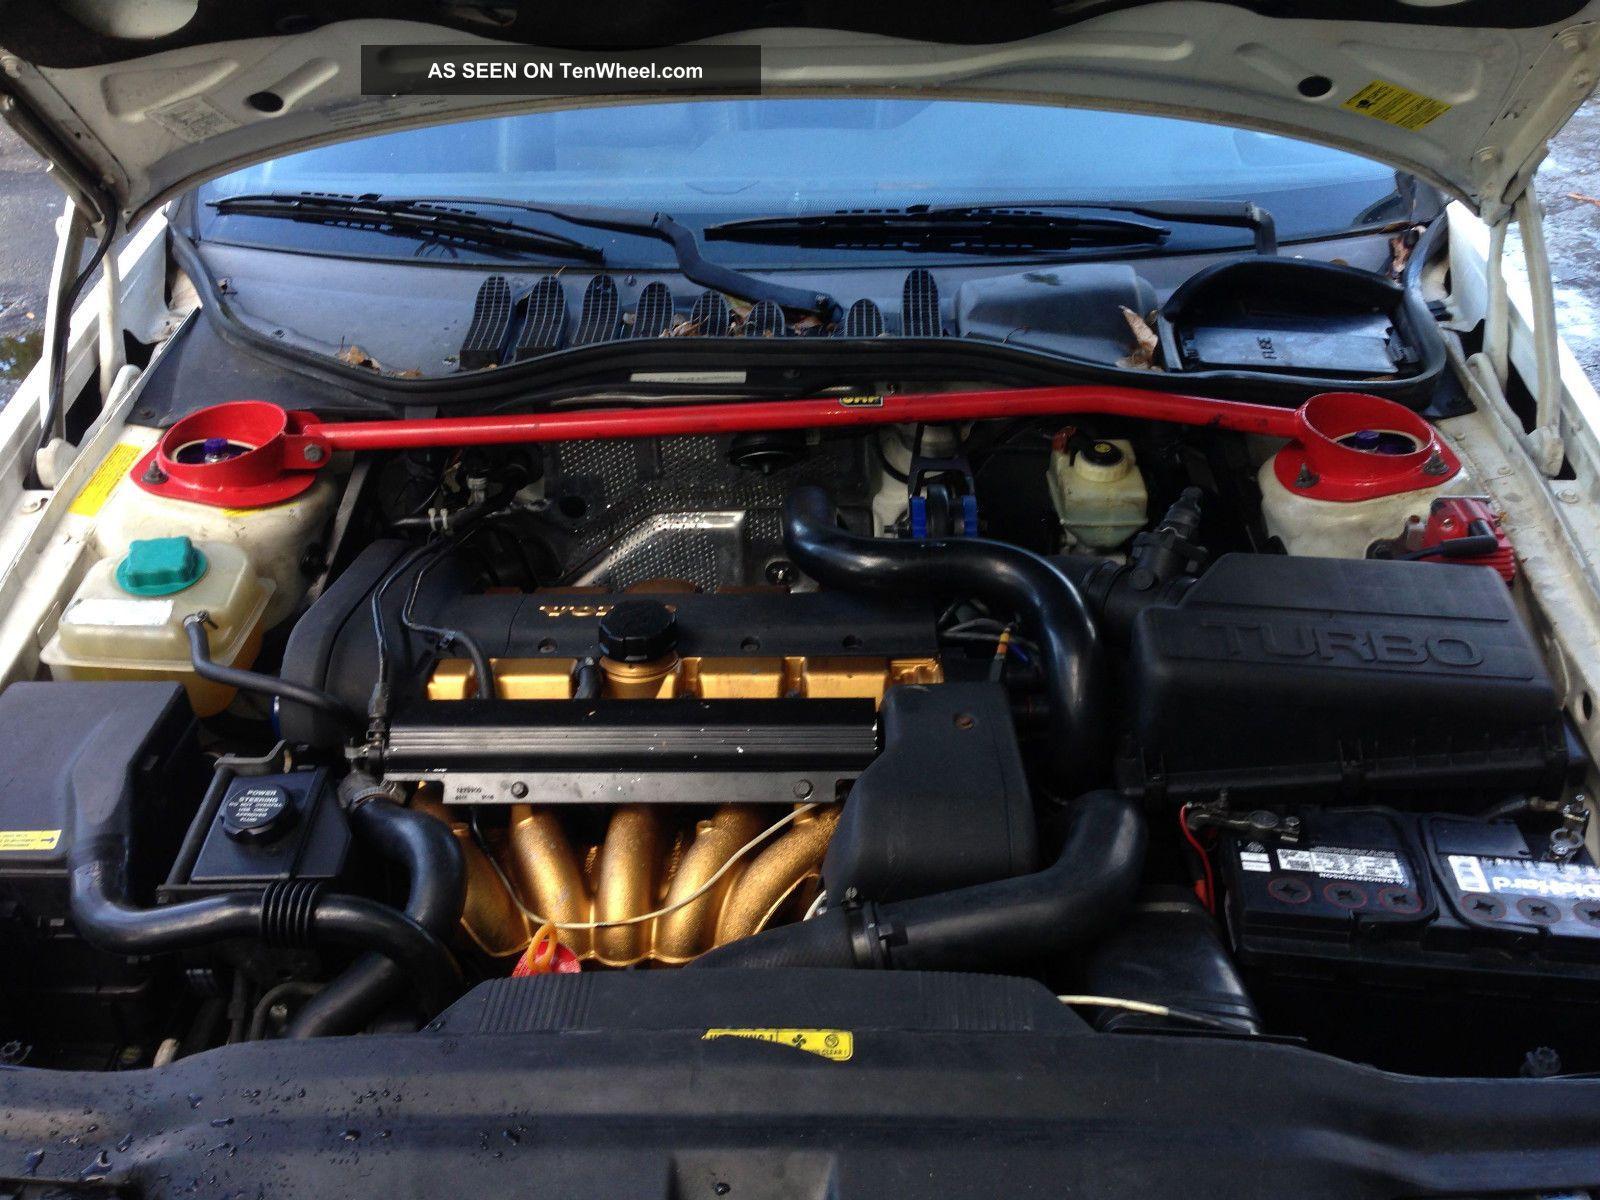 1996 volvo 850 turbo with manual transmission rh tenwheel com volvo 850 manual transmission fluid capacity volvo 850 manual transmission oil